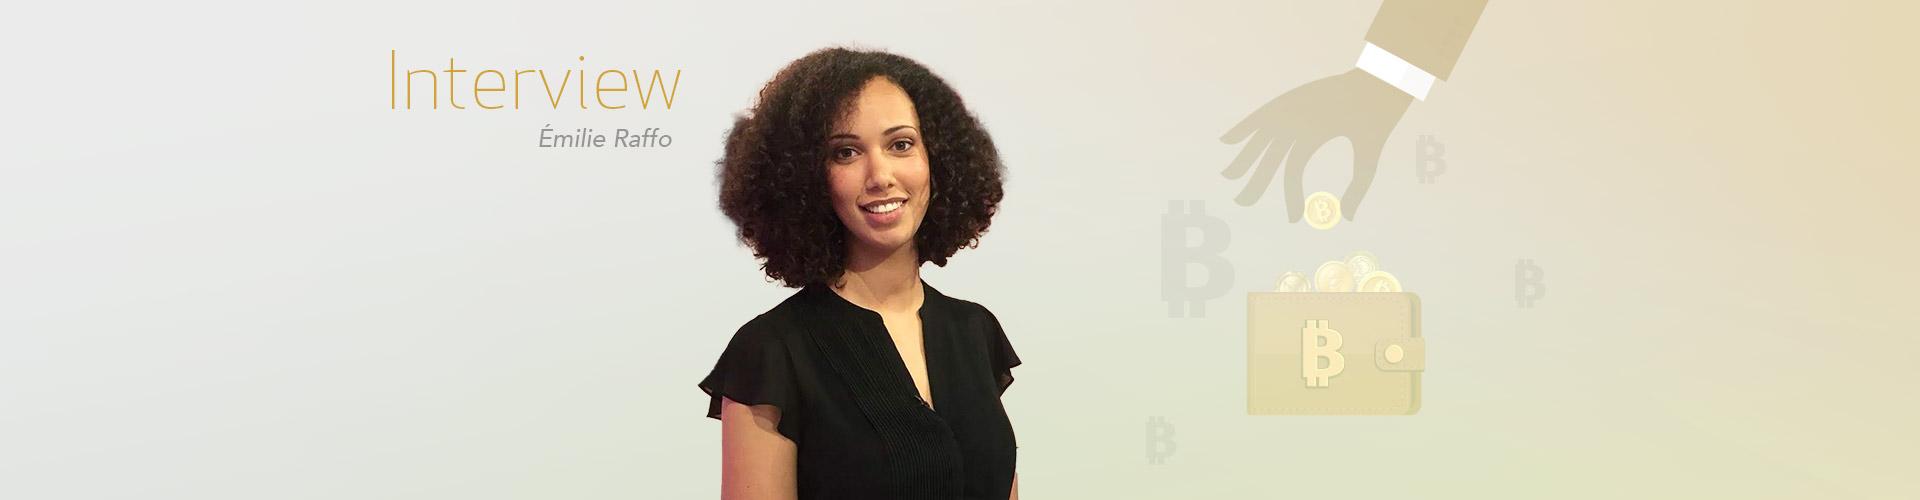 Le Futur des especes - cryptomonaies bitcoin - Emilie Raffo